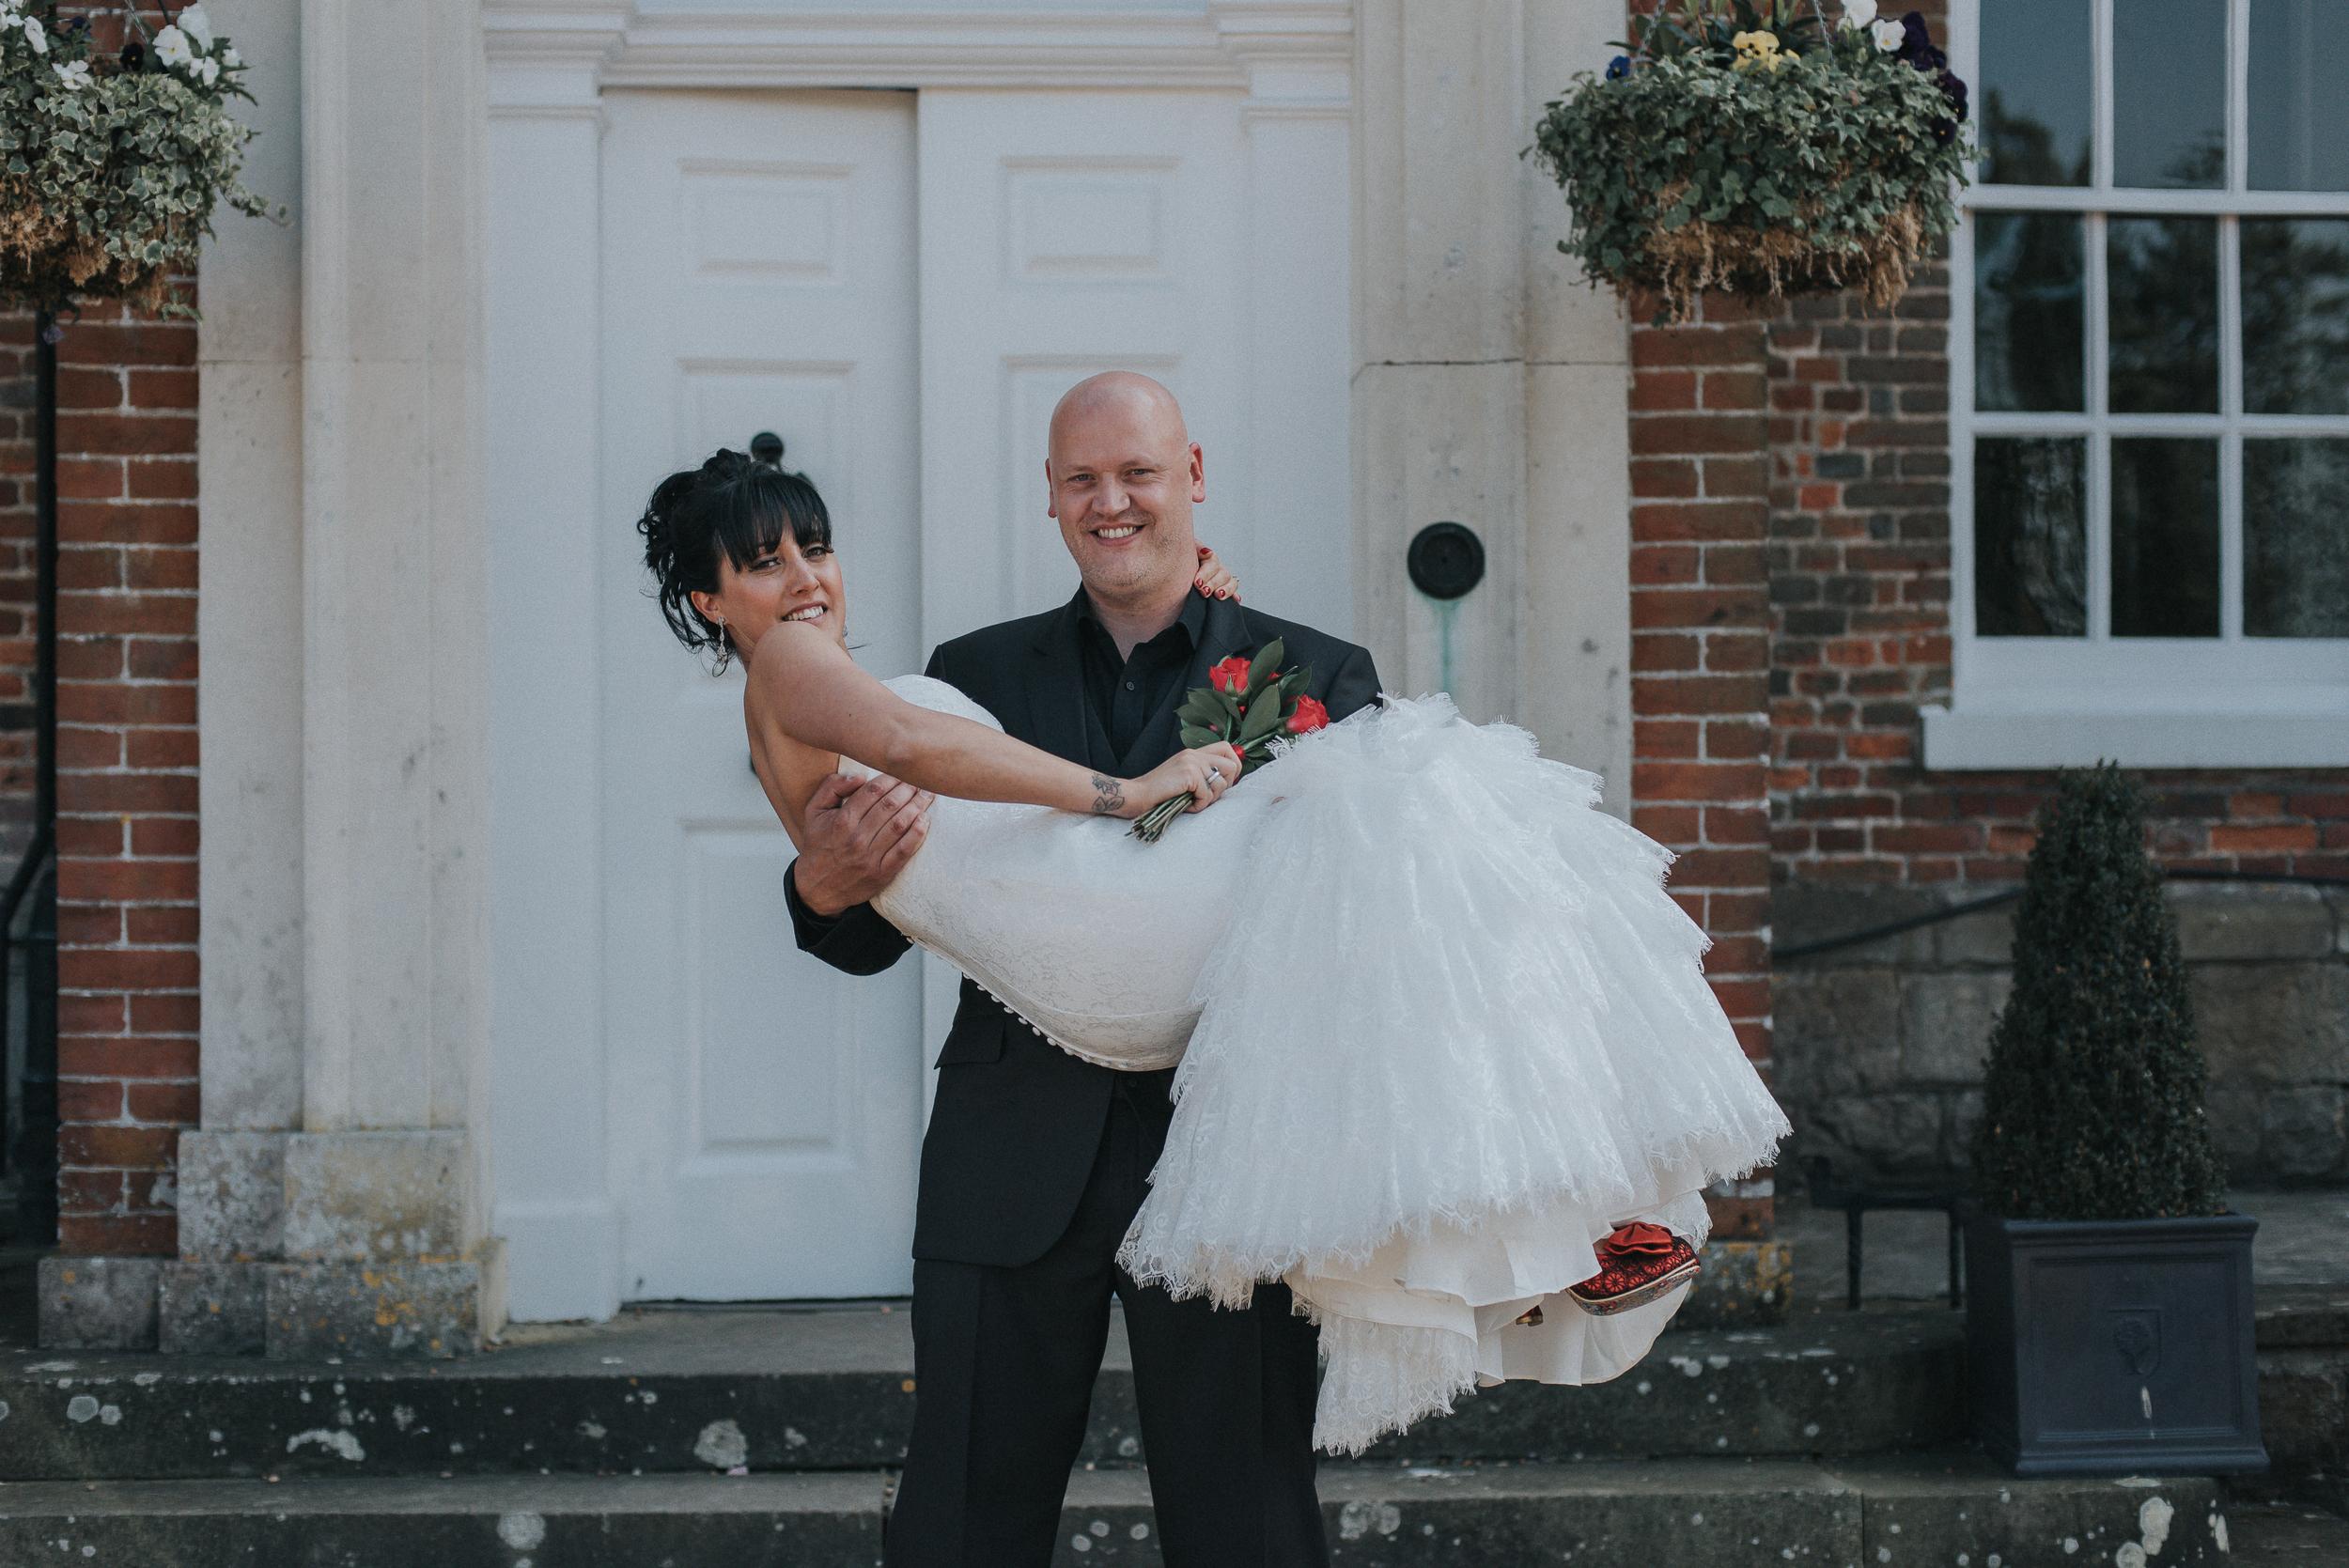 Sasha and Tim Wedding Photography Jay Tunbridge187.jpg